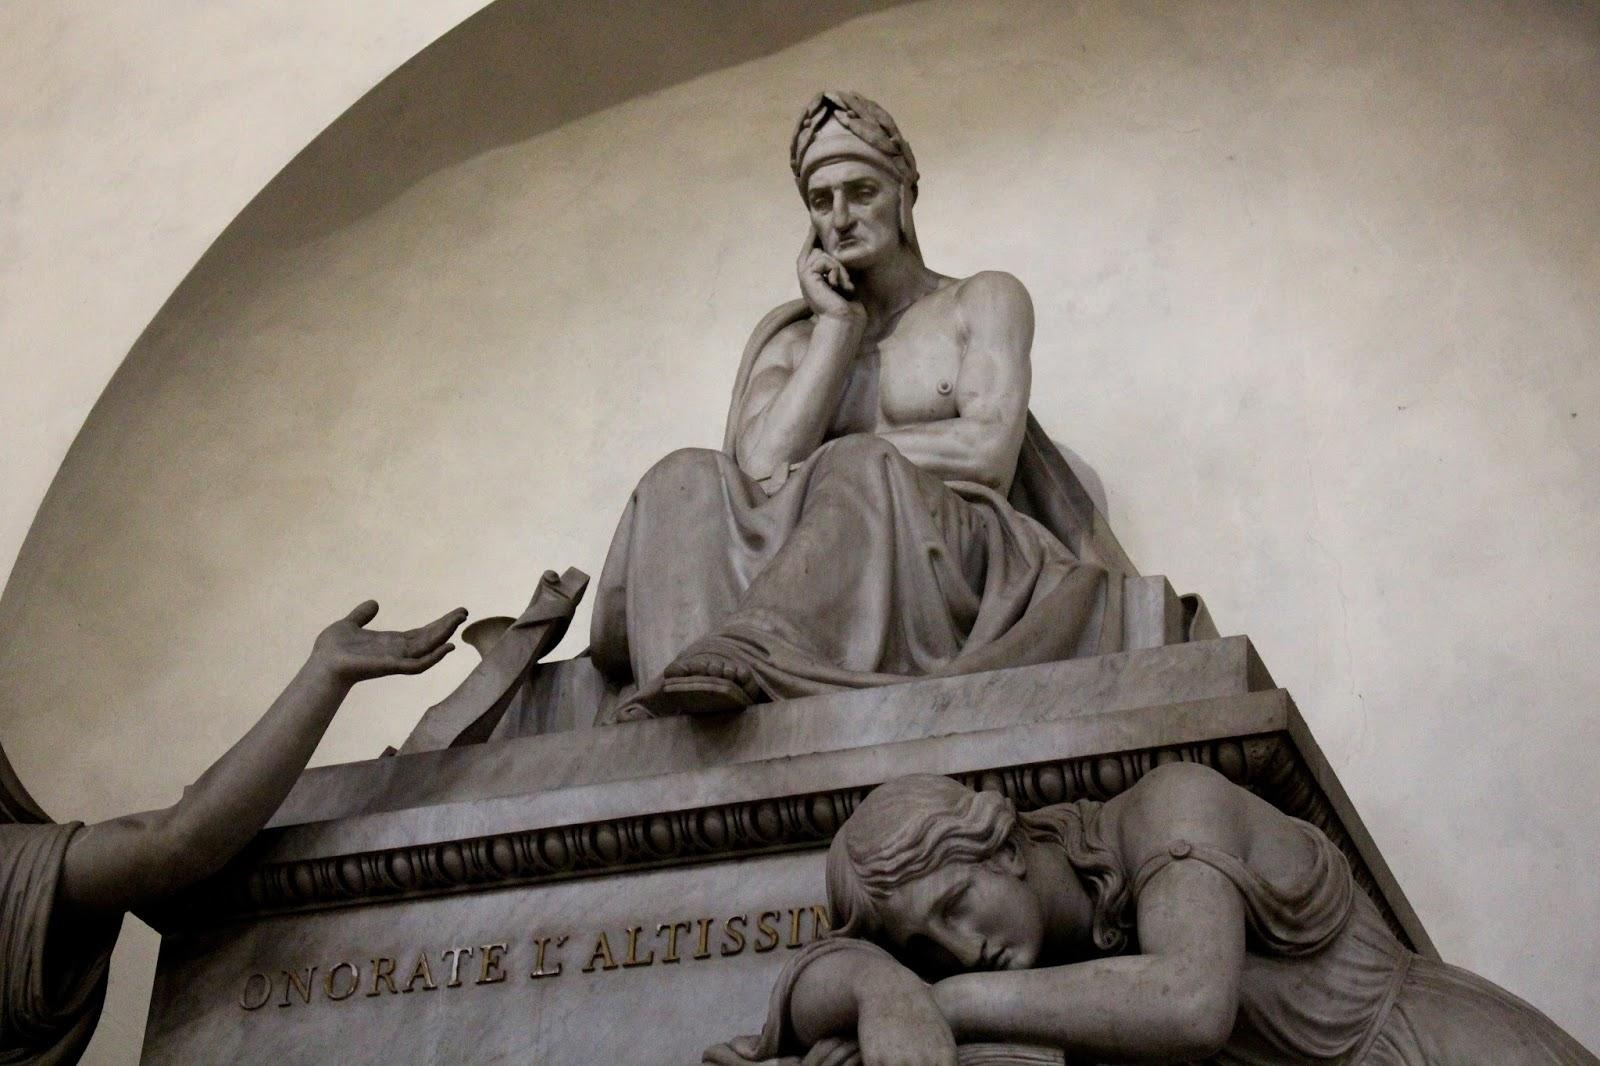 Memoriale Dante Alighieri, Santa Croce, Firenze